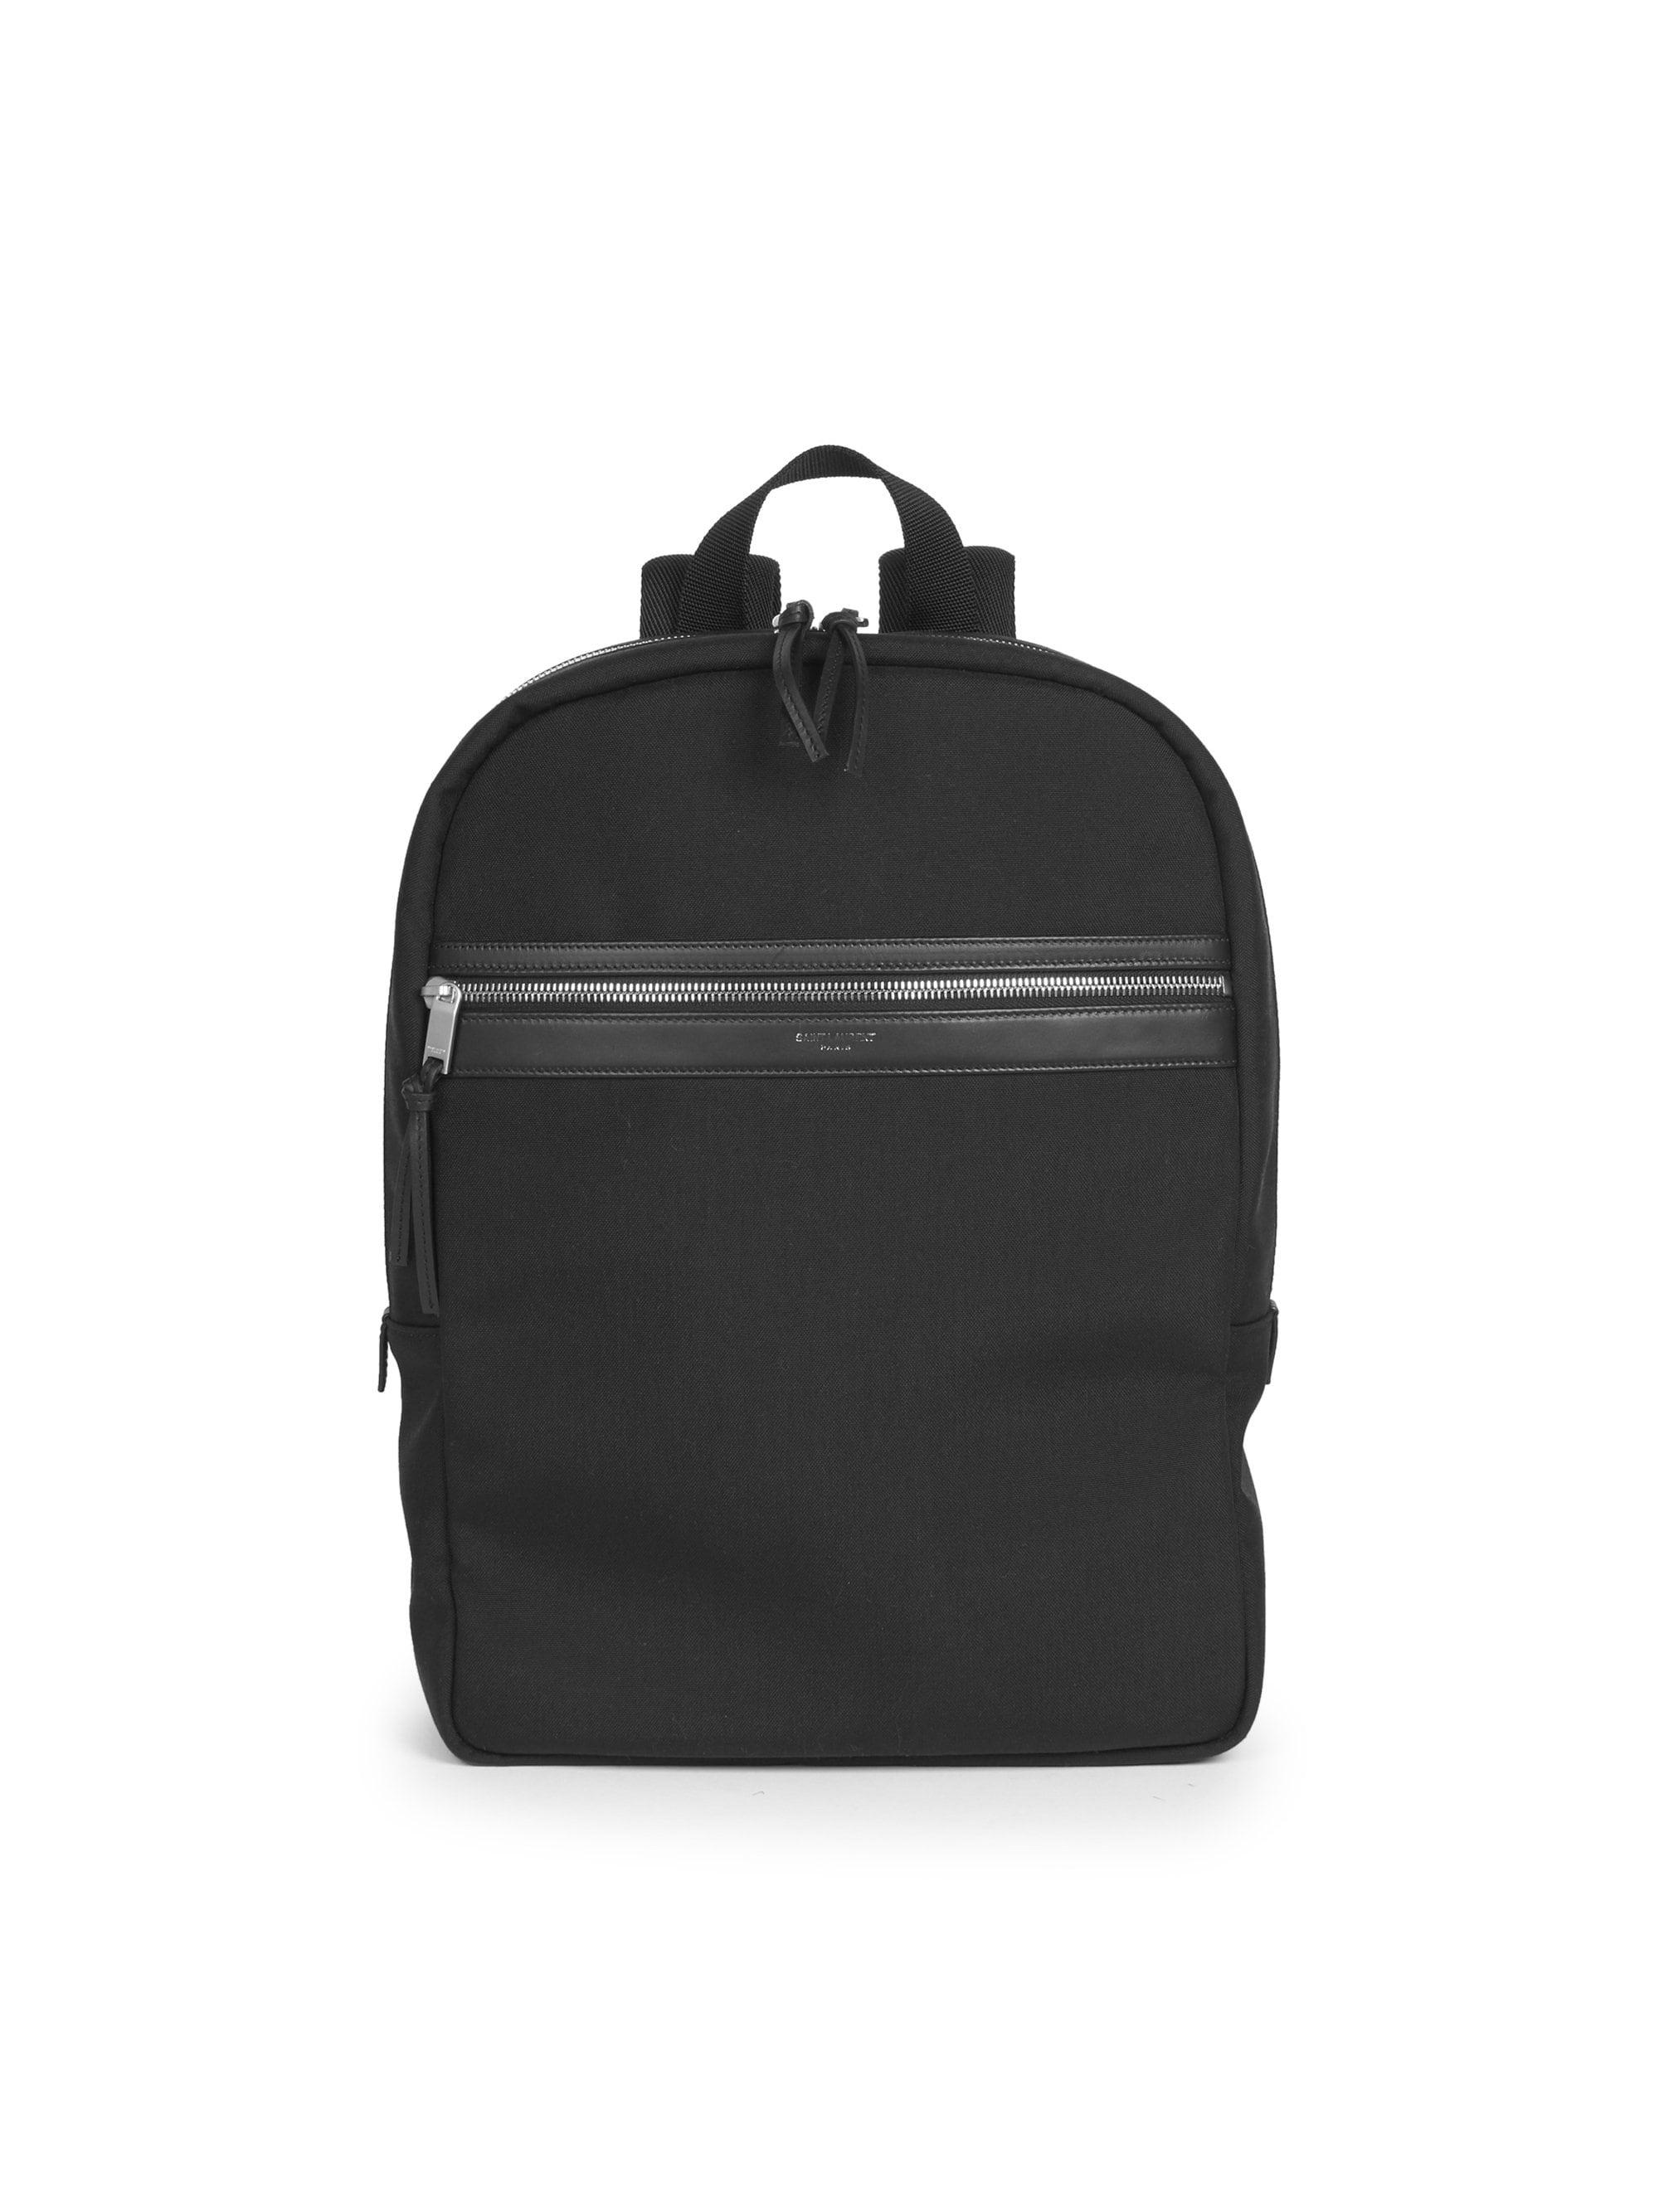 84232a2b4 Lyst - Saint Laurent Classic Zip Canvas Backpack in Black for Men